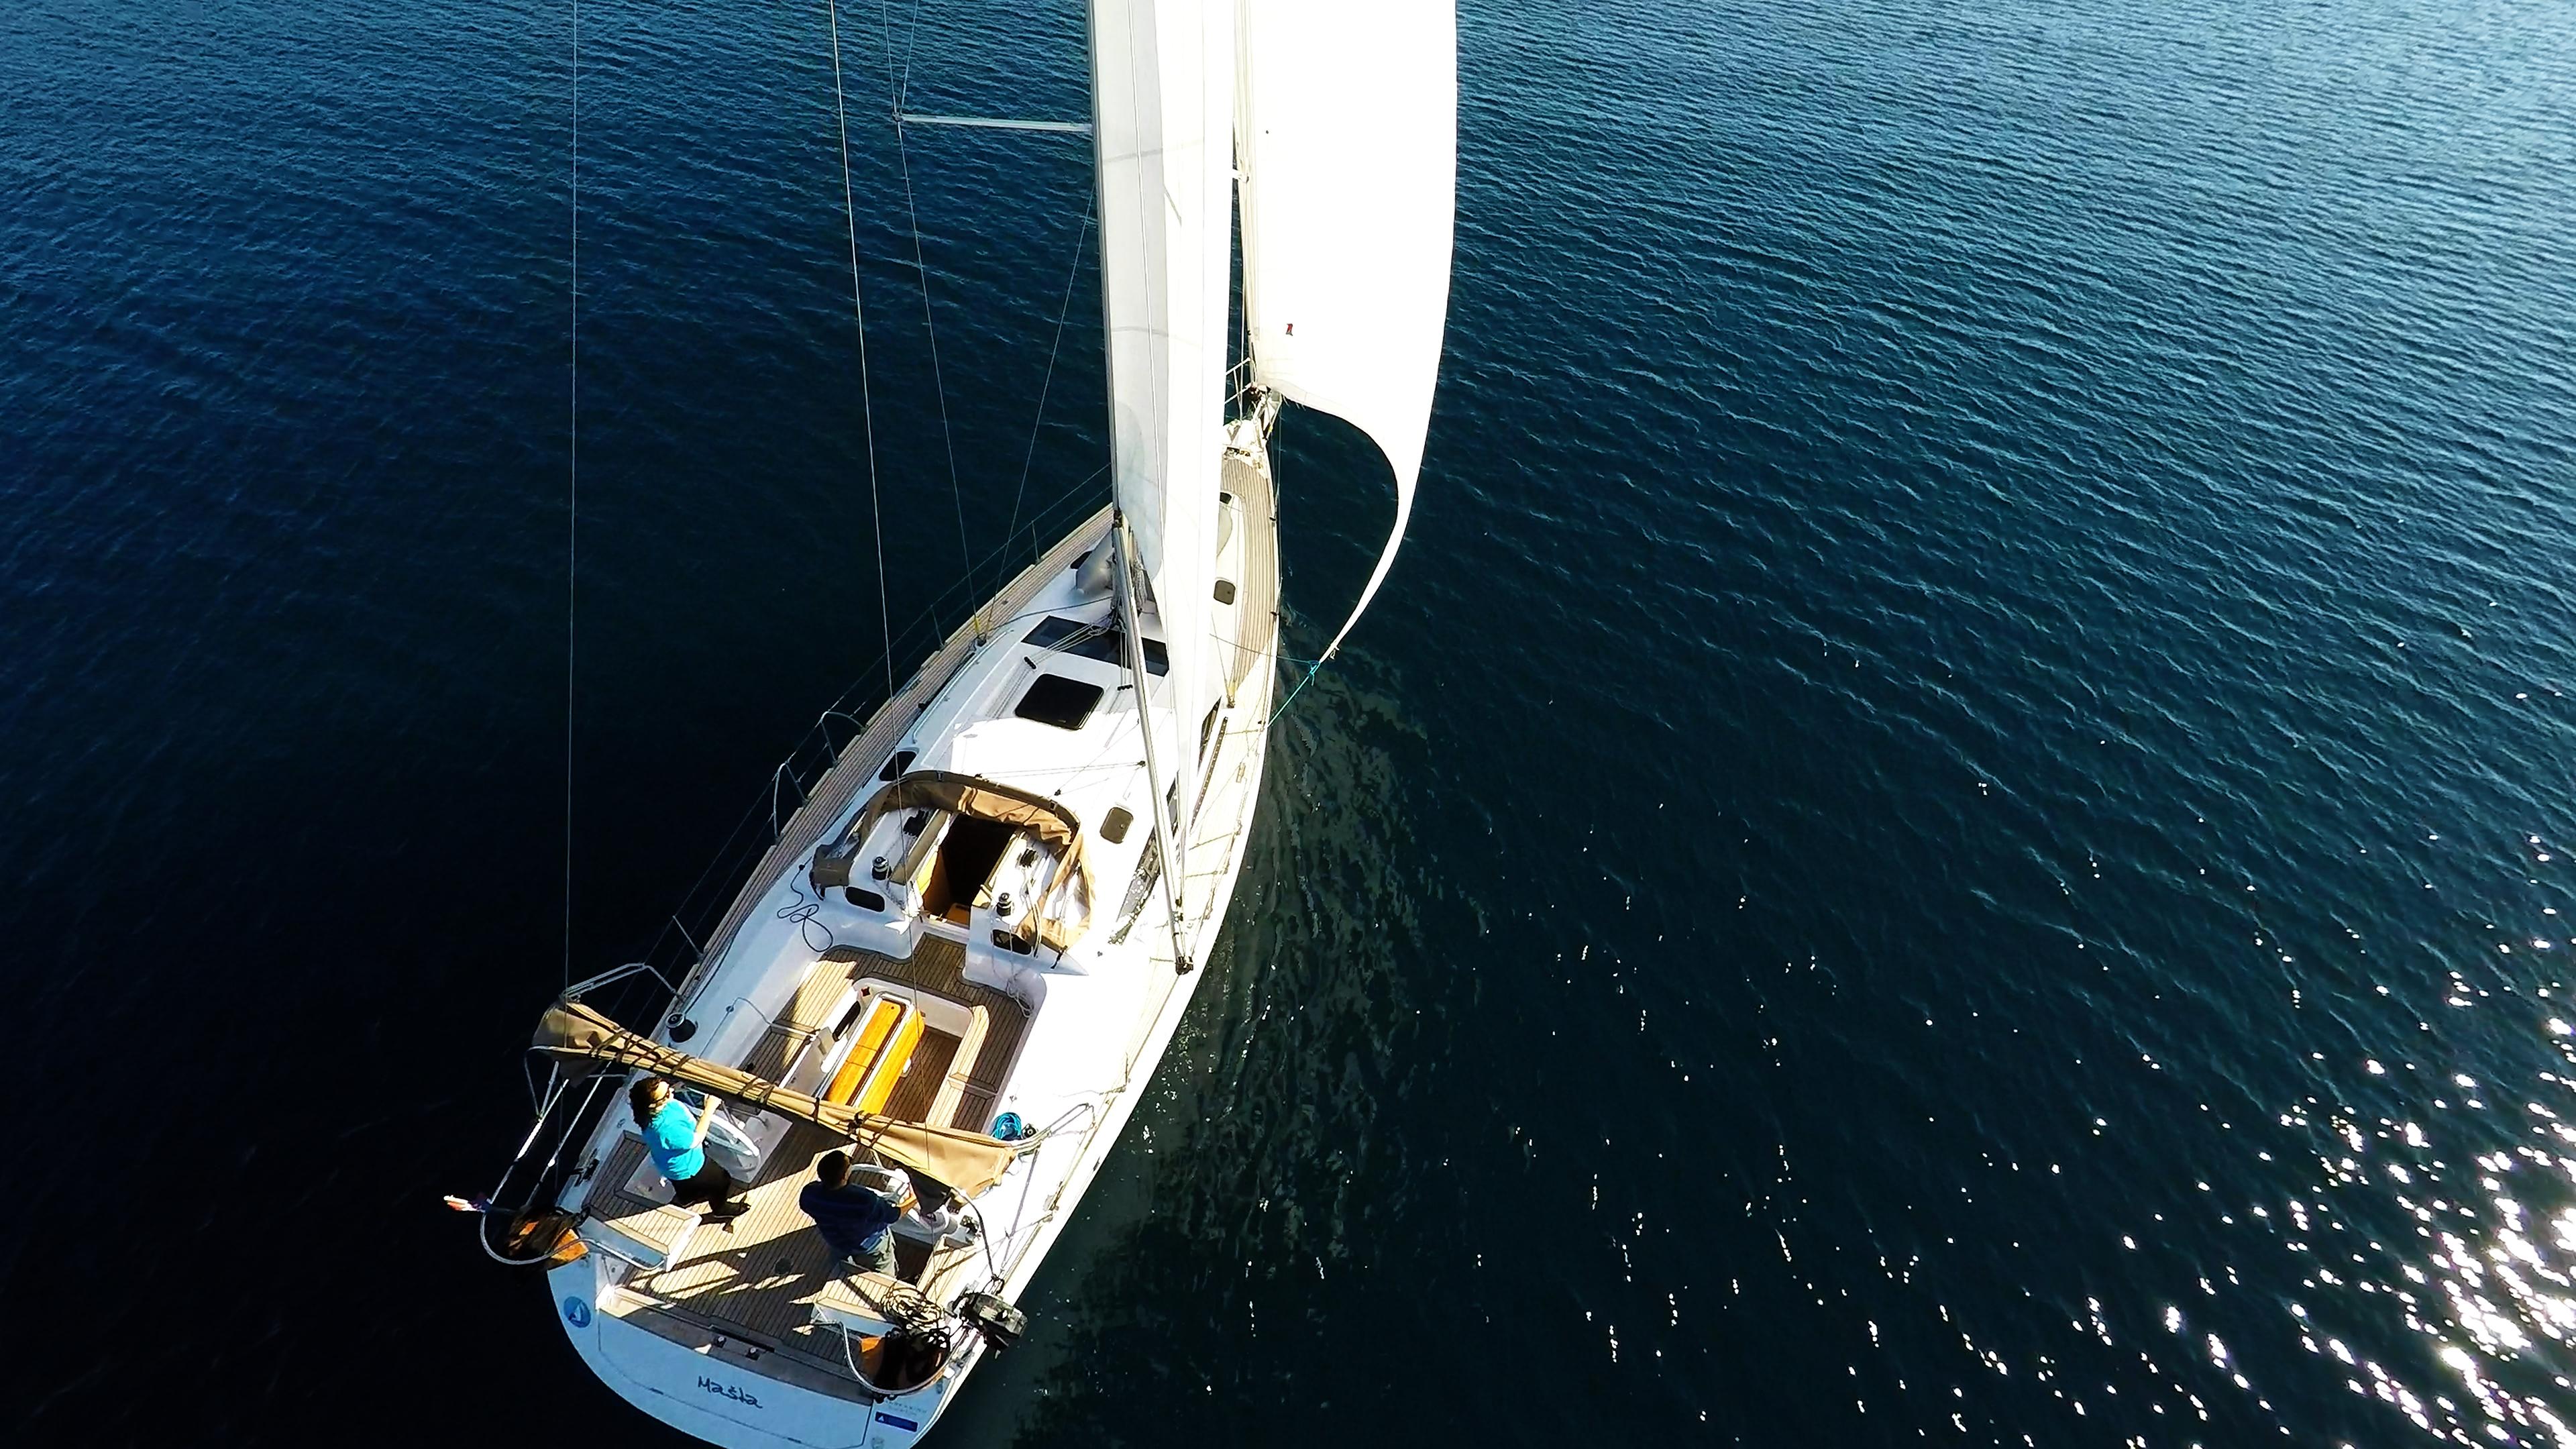 barcha a vela yacht a vela elan 45 impression vela ponte teak timoni ruota